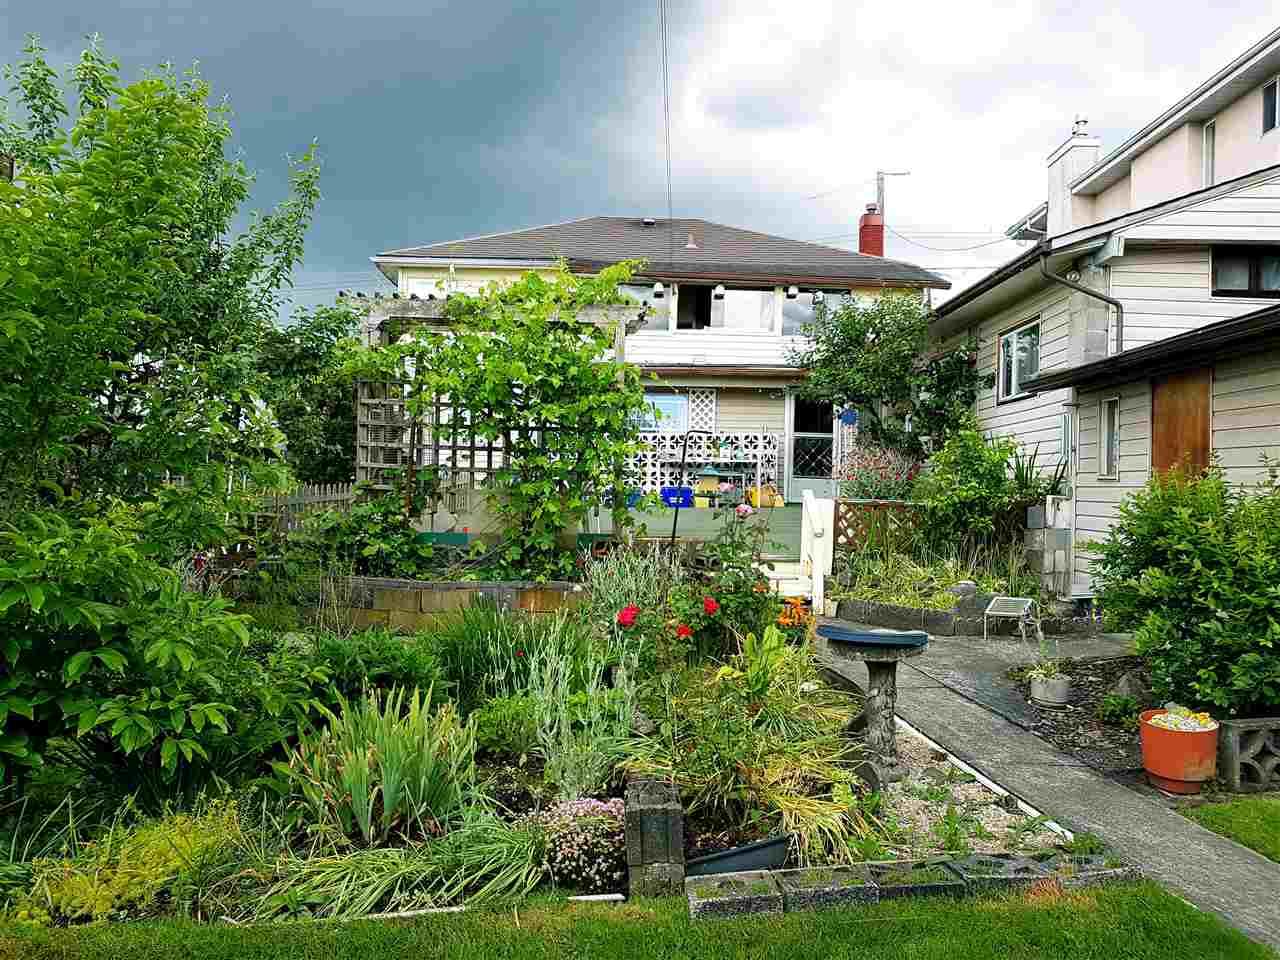 Detached at 3912 NAPIER STREET, Burnaby North, British Columbia. Image 4